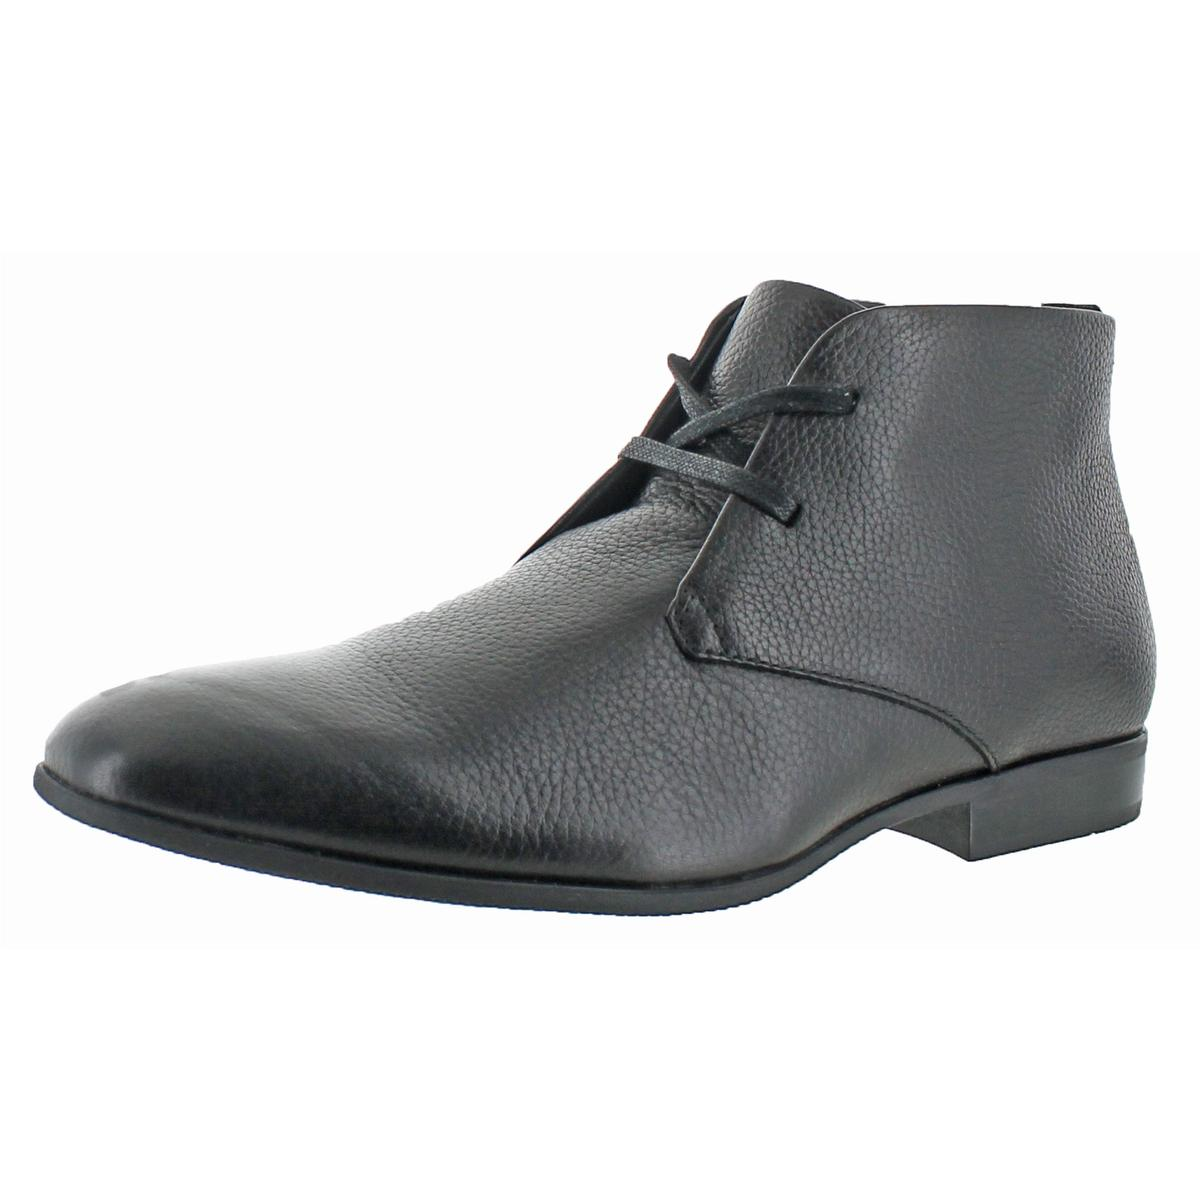 Calvin Klein Mens Carmichael Black Chukka Boots Shoes 8 Medium (D) BHFO 6609